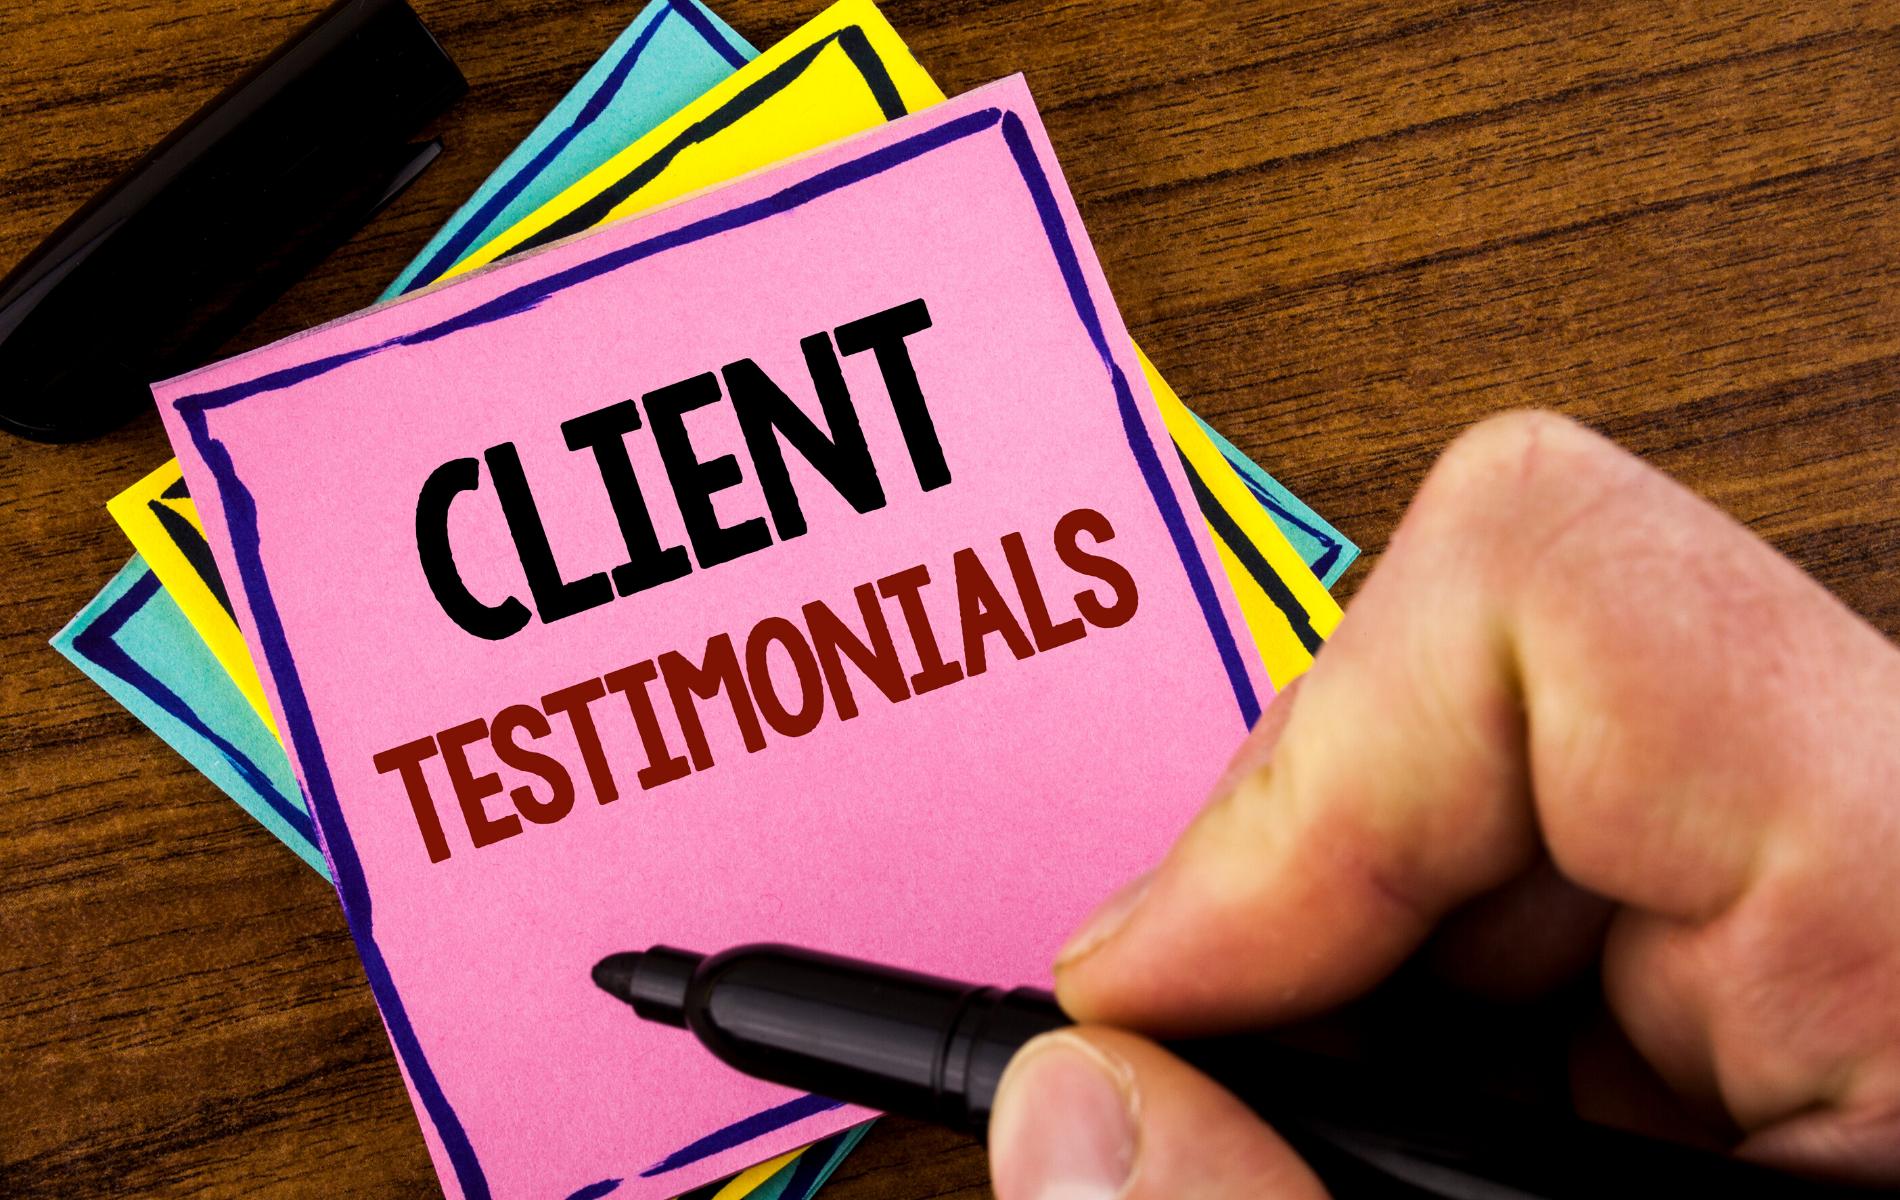 Image of Client Testimonials written on post it